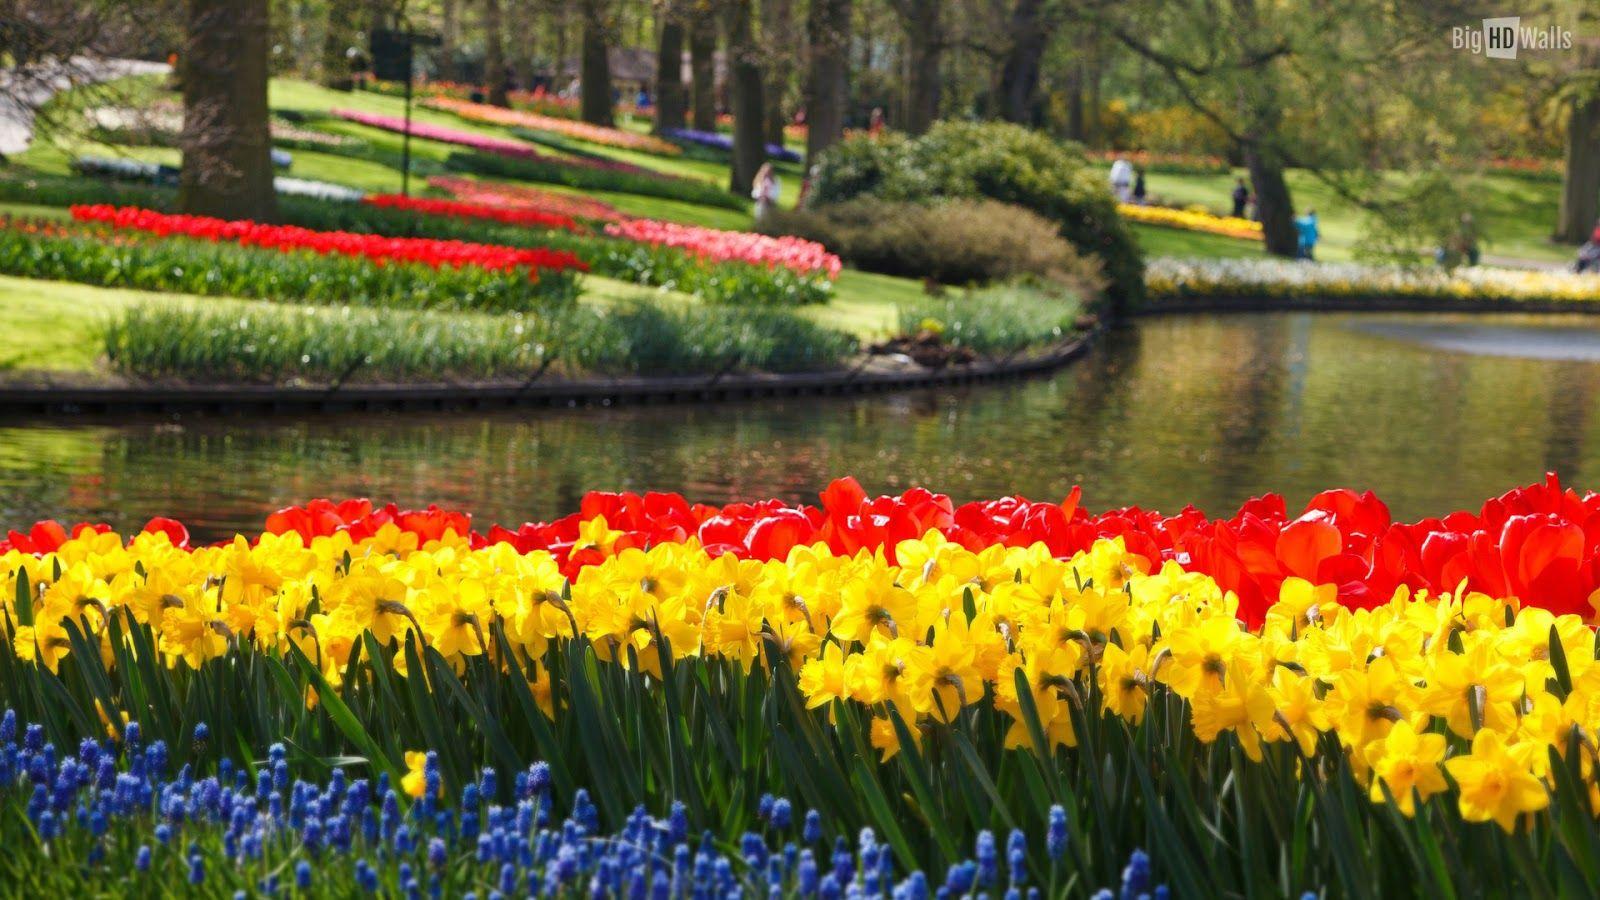 Aneka Gambar Bunga Tulip Yang Mengesankan Mata Pernik Dunia